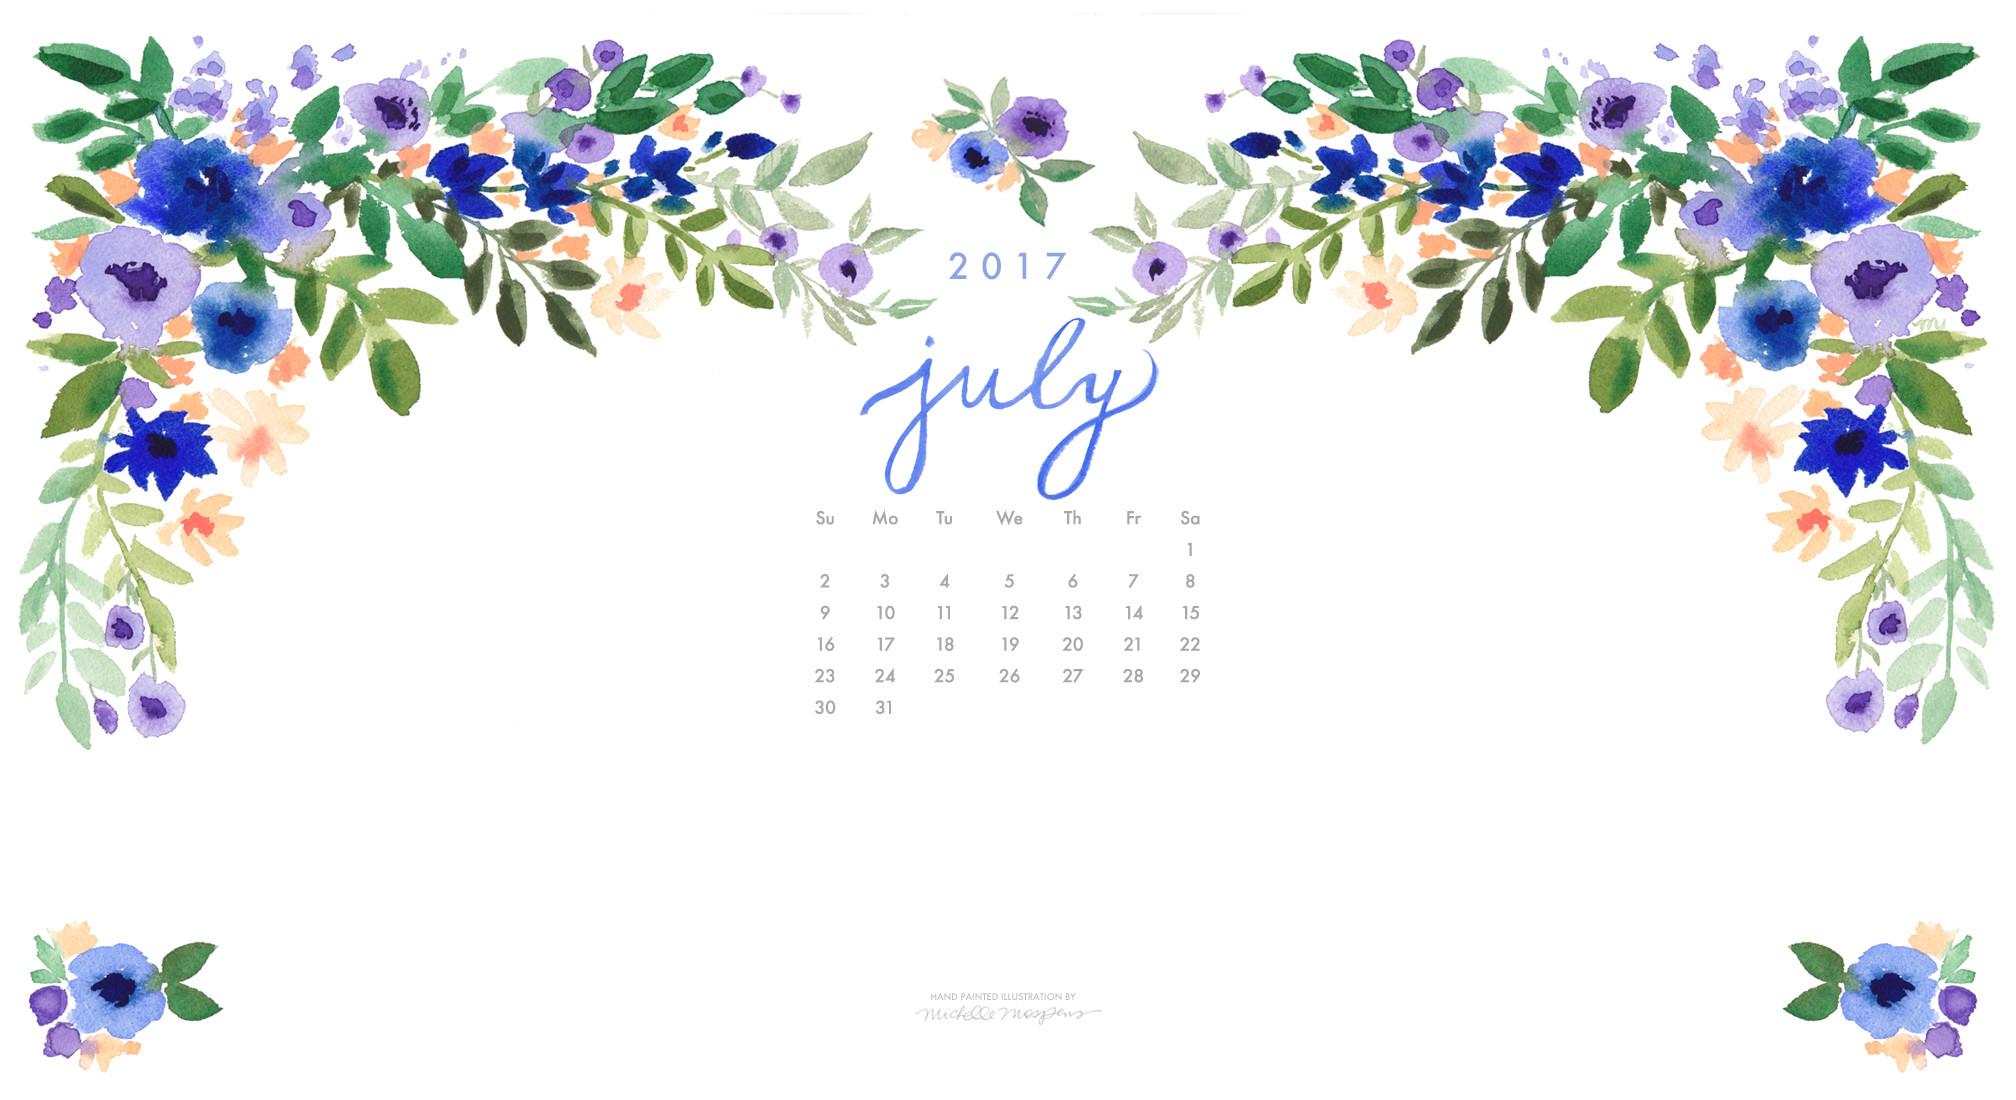 Pretty posy watercolor July 2017 calendar wallpaper for your computer. 100%  original art by